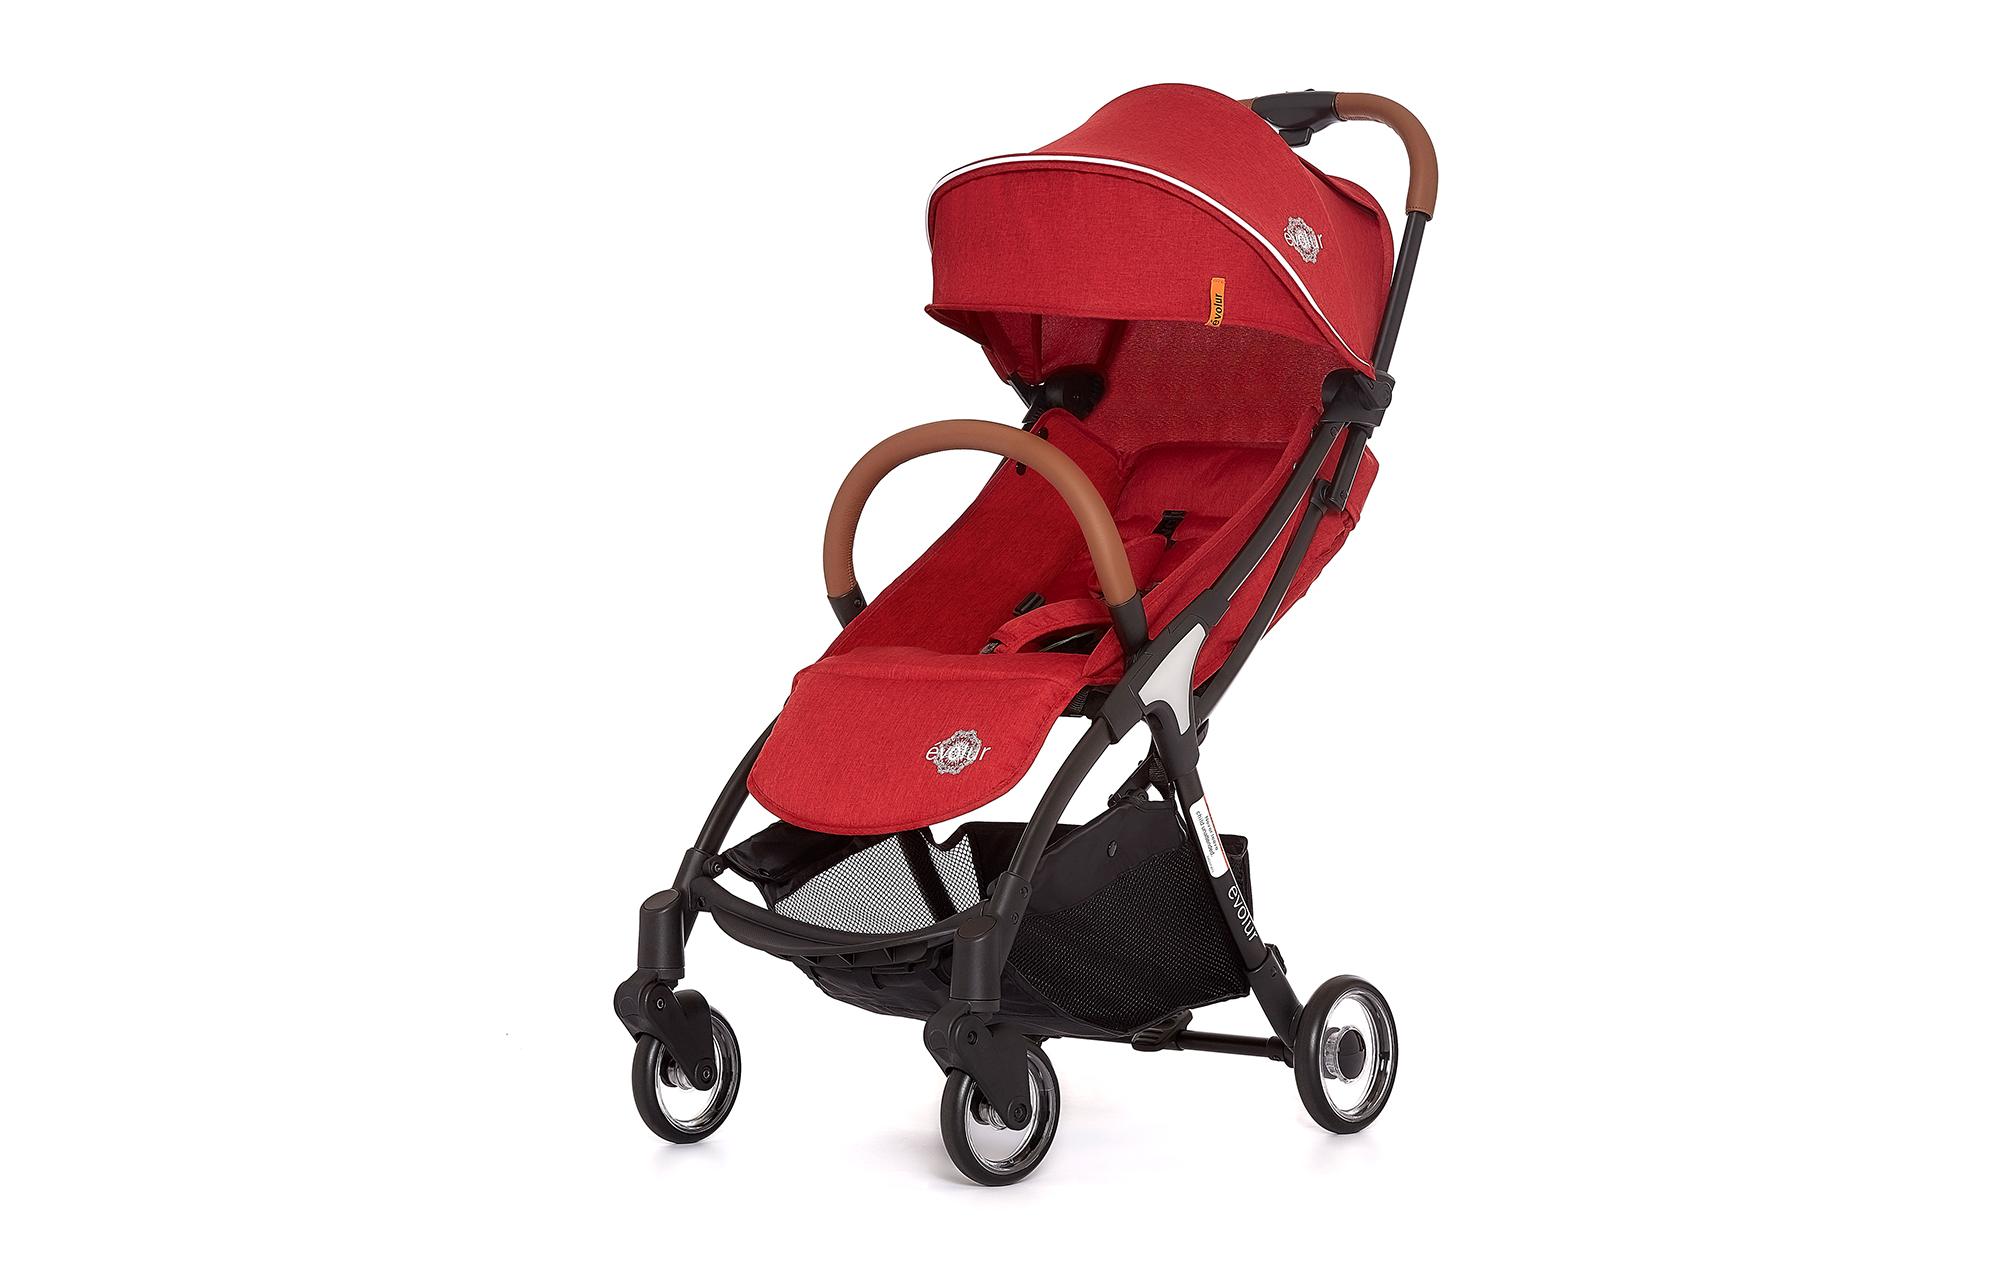 Evolur Vogue Stroller Red 01